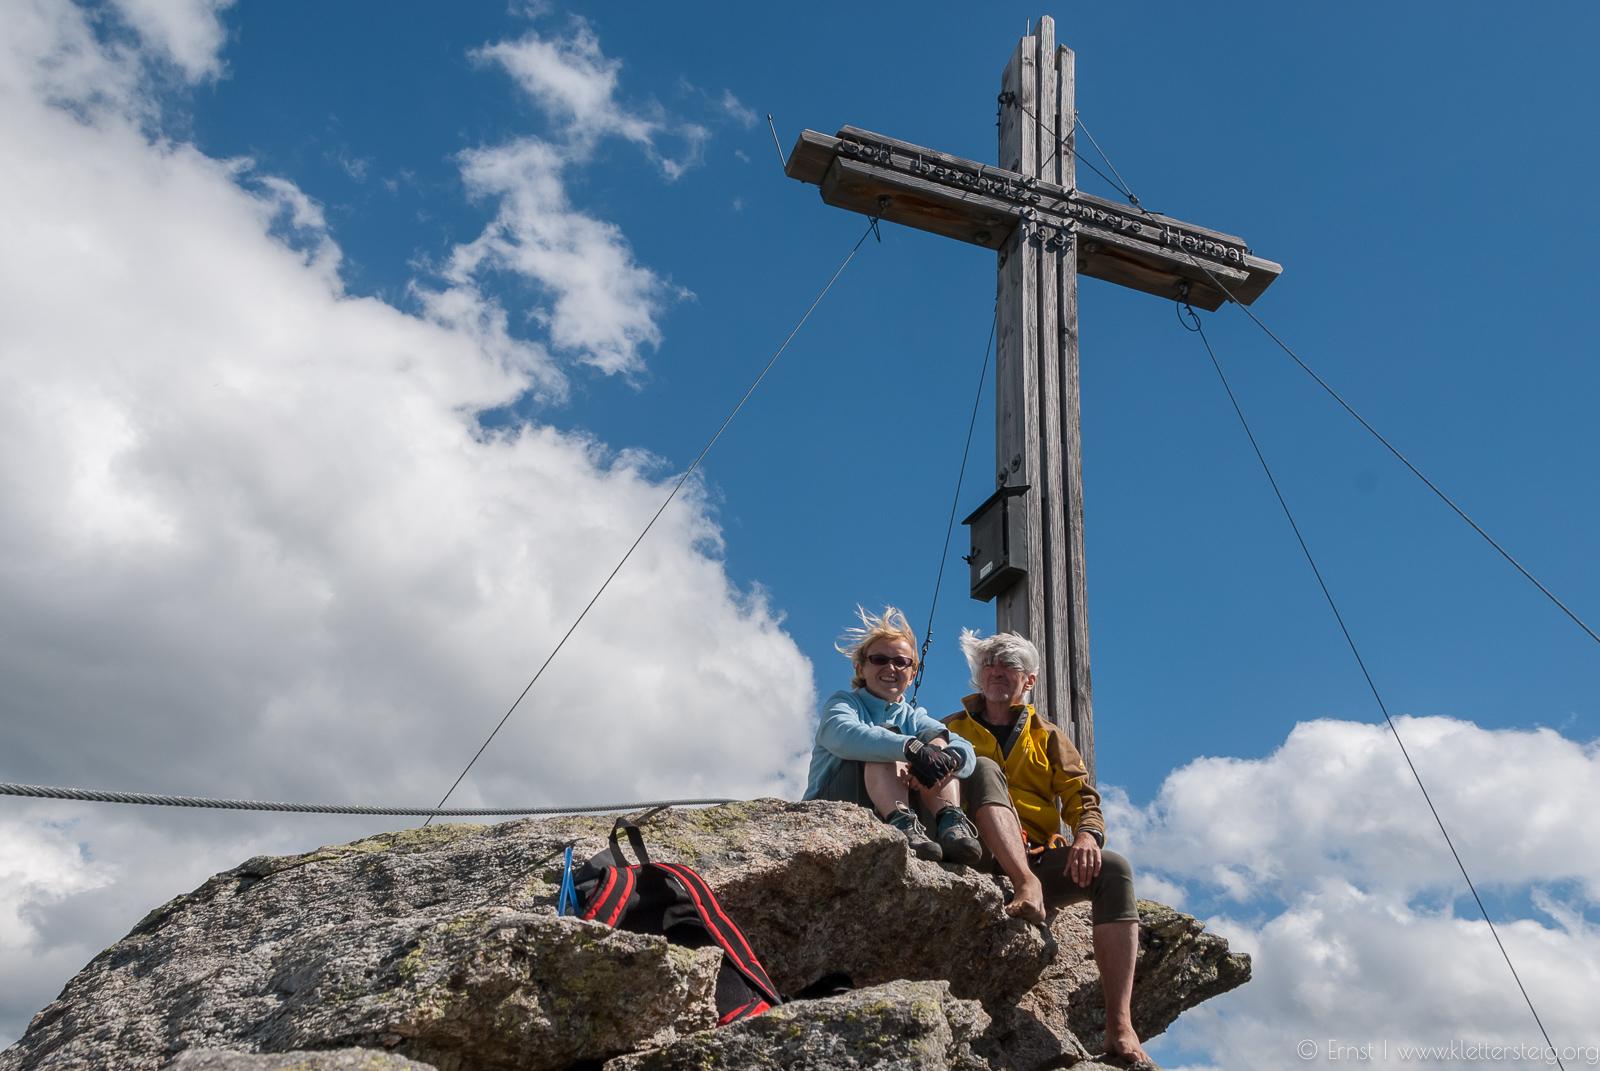 Silvapark Klettersteig am Gipfel der Balunspitze